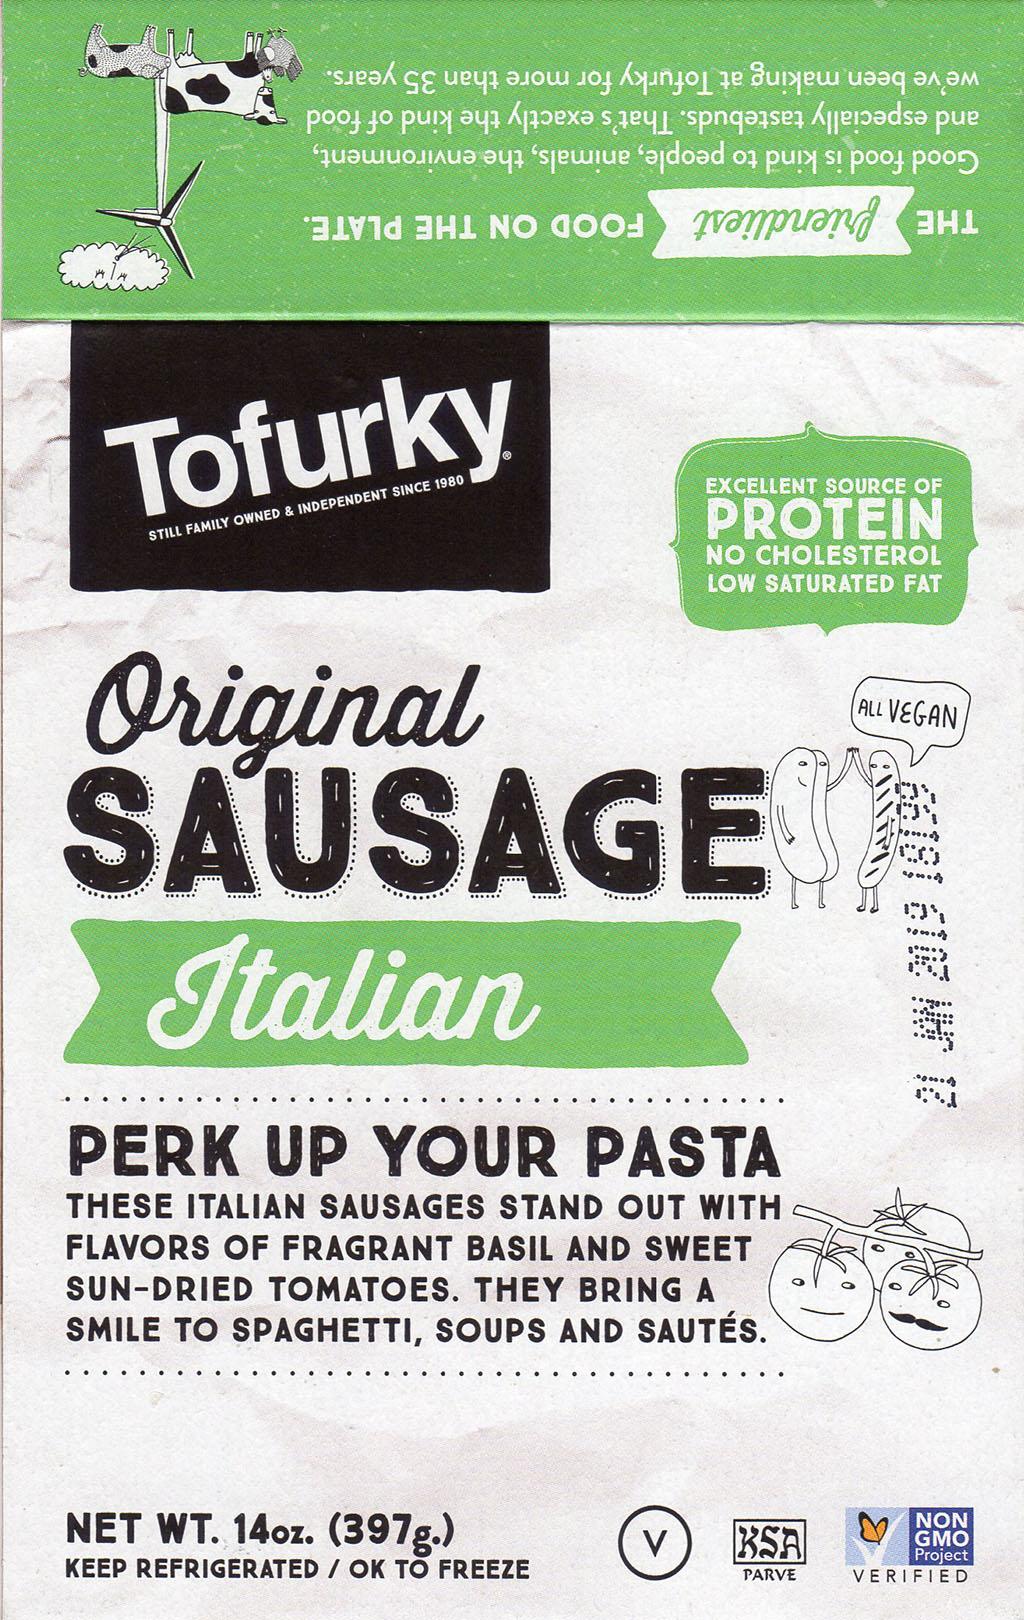 Tofurky Original Sausage Italian package front